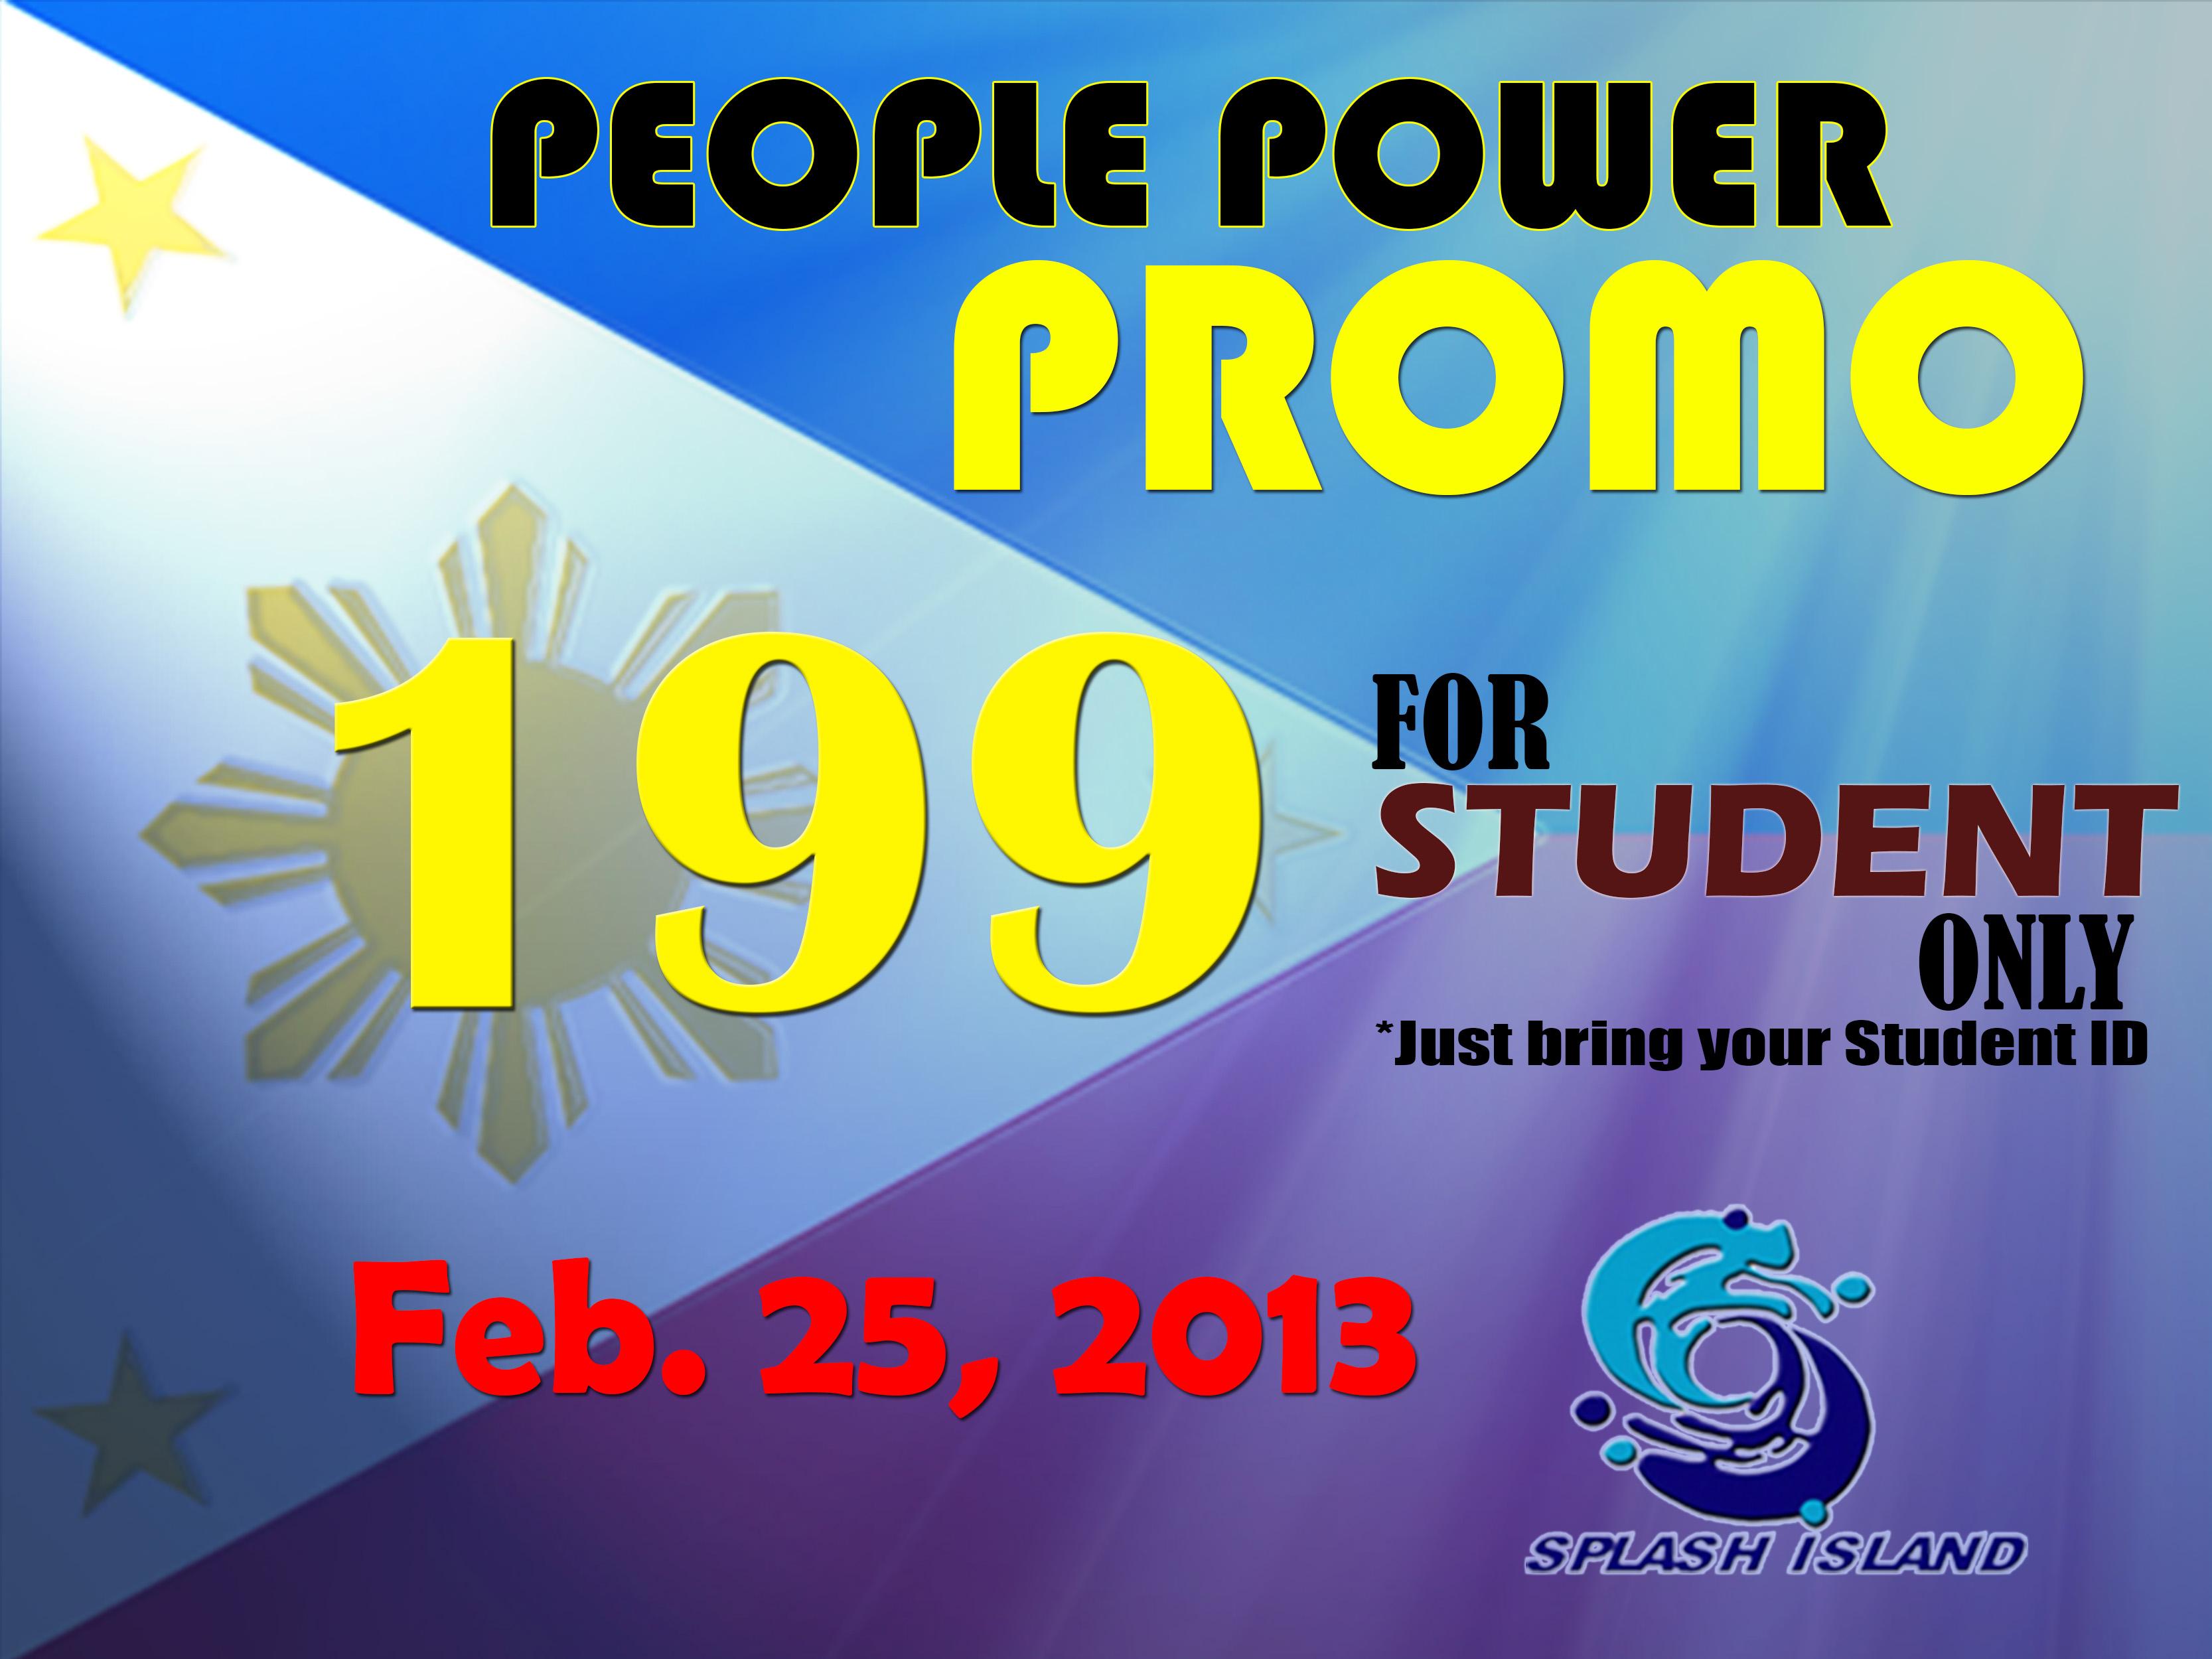 Splash Island People Power Promo February 2013